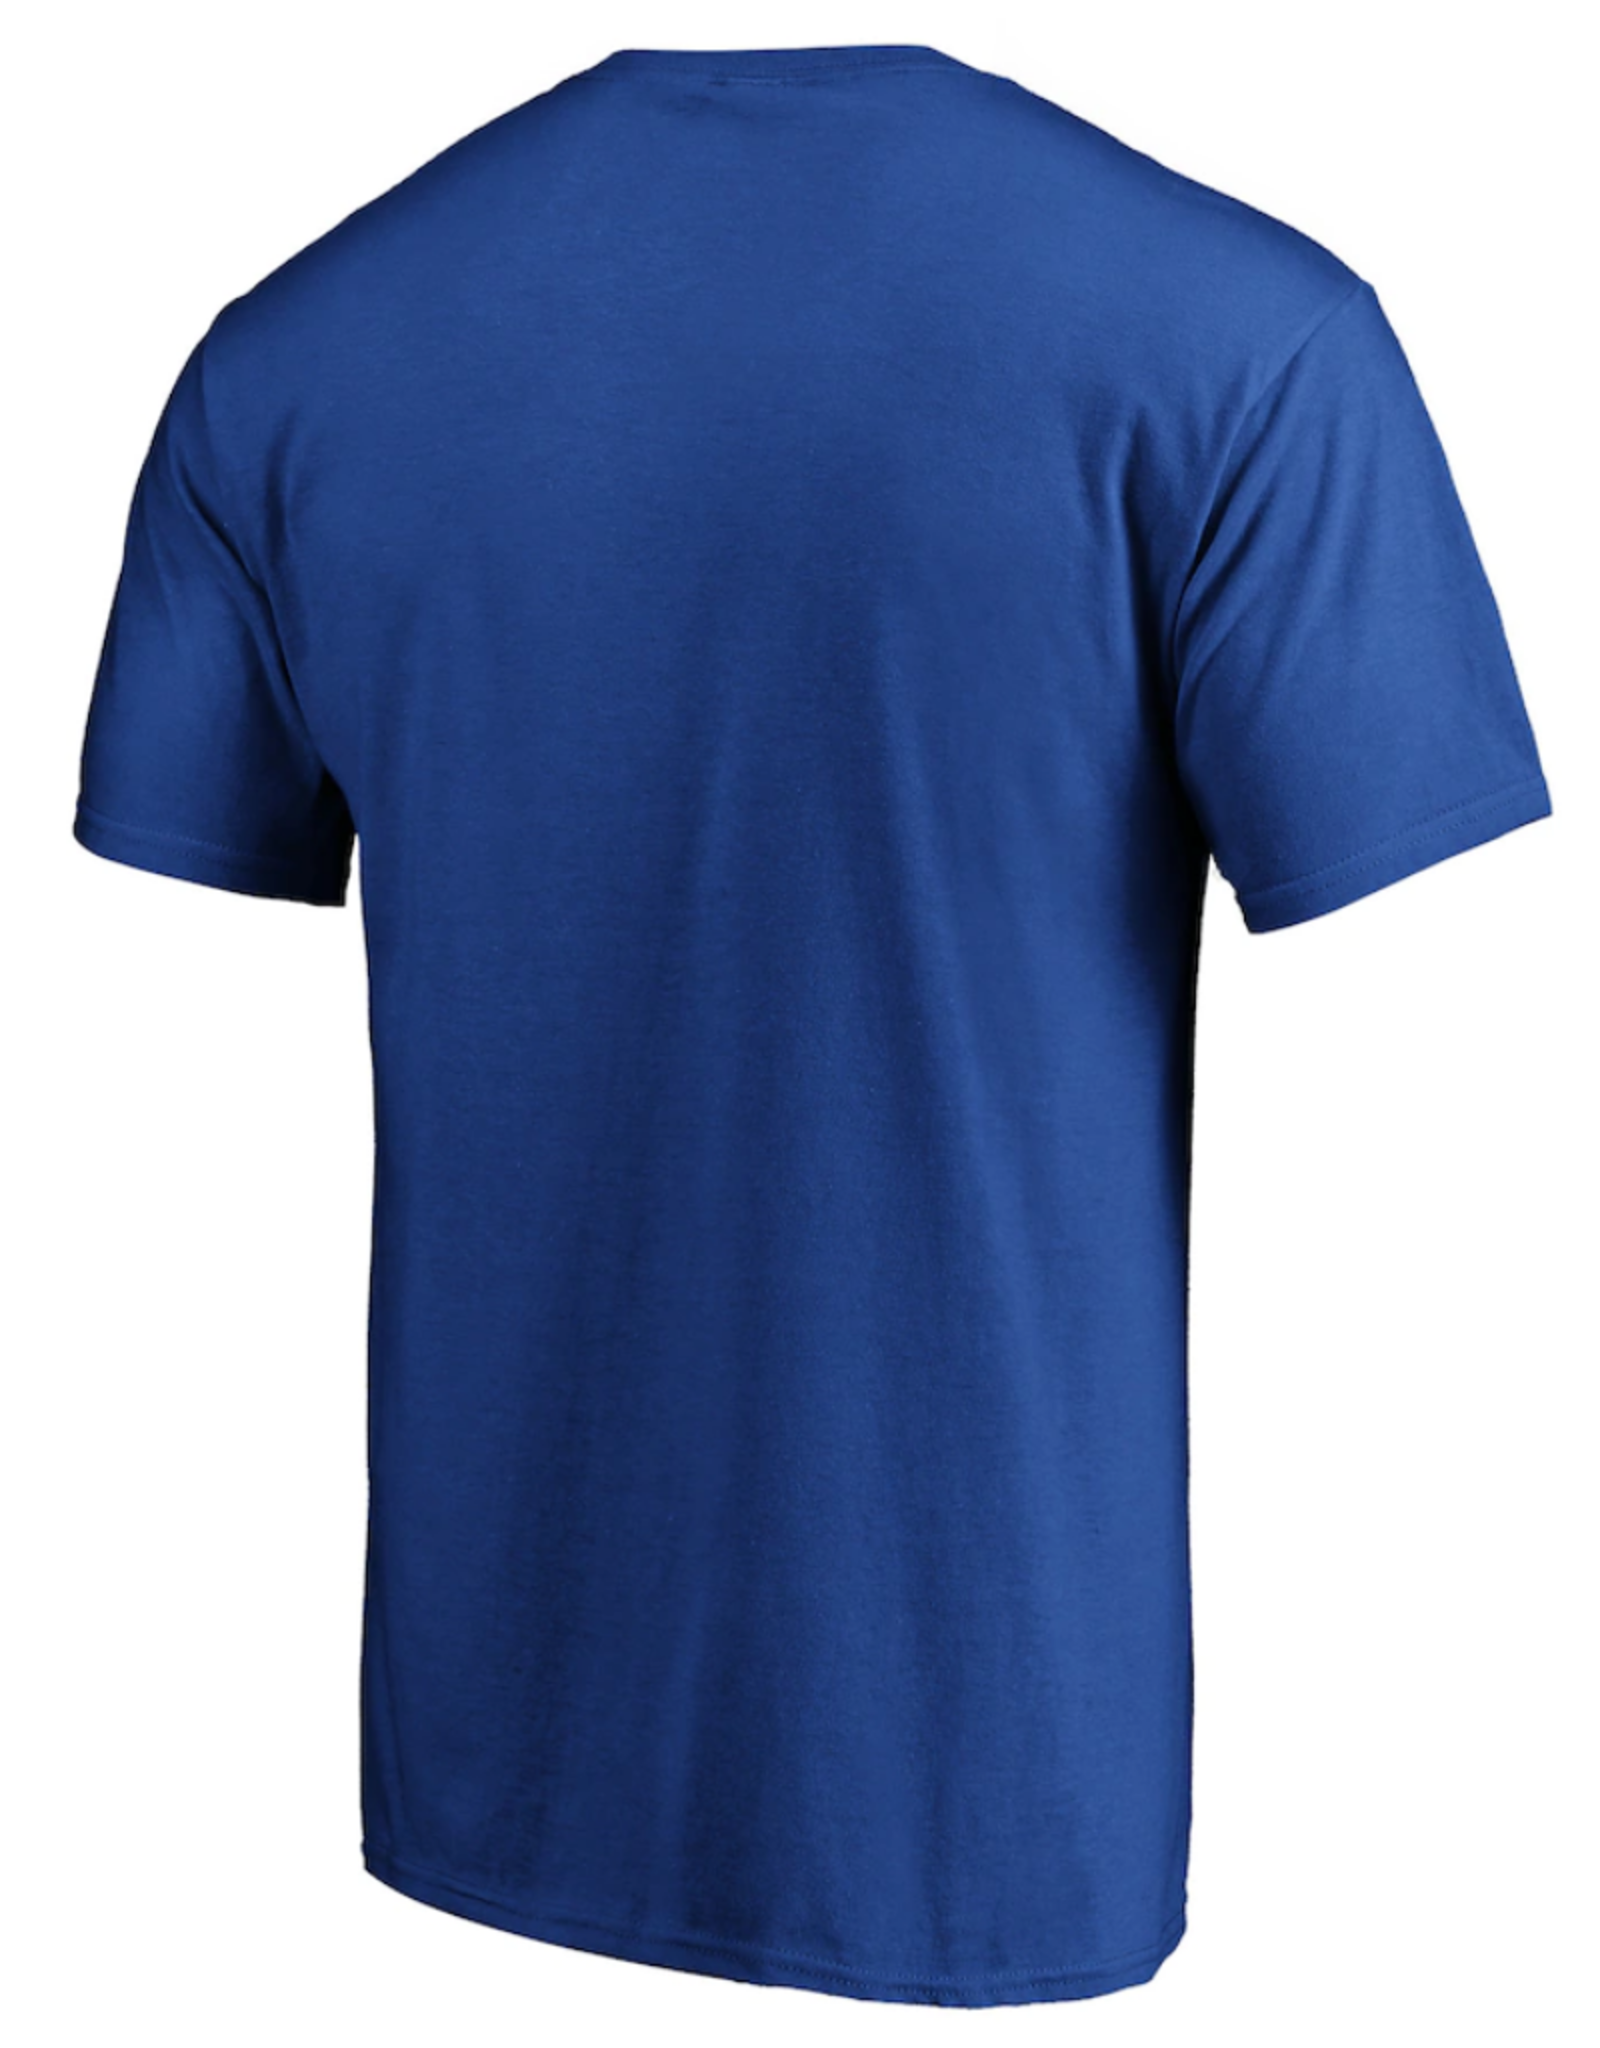 Fanatics Fanatics Men's Authentic Pro Rinkside Prime New York Islanders T-Shirt Blue